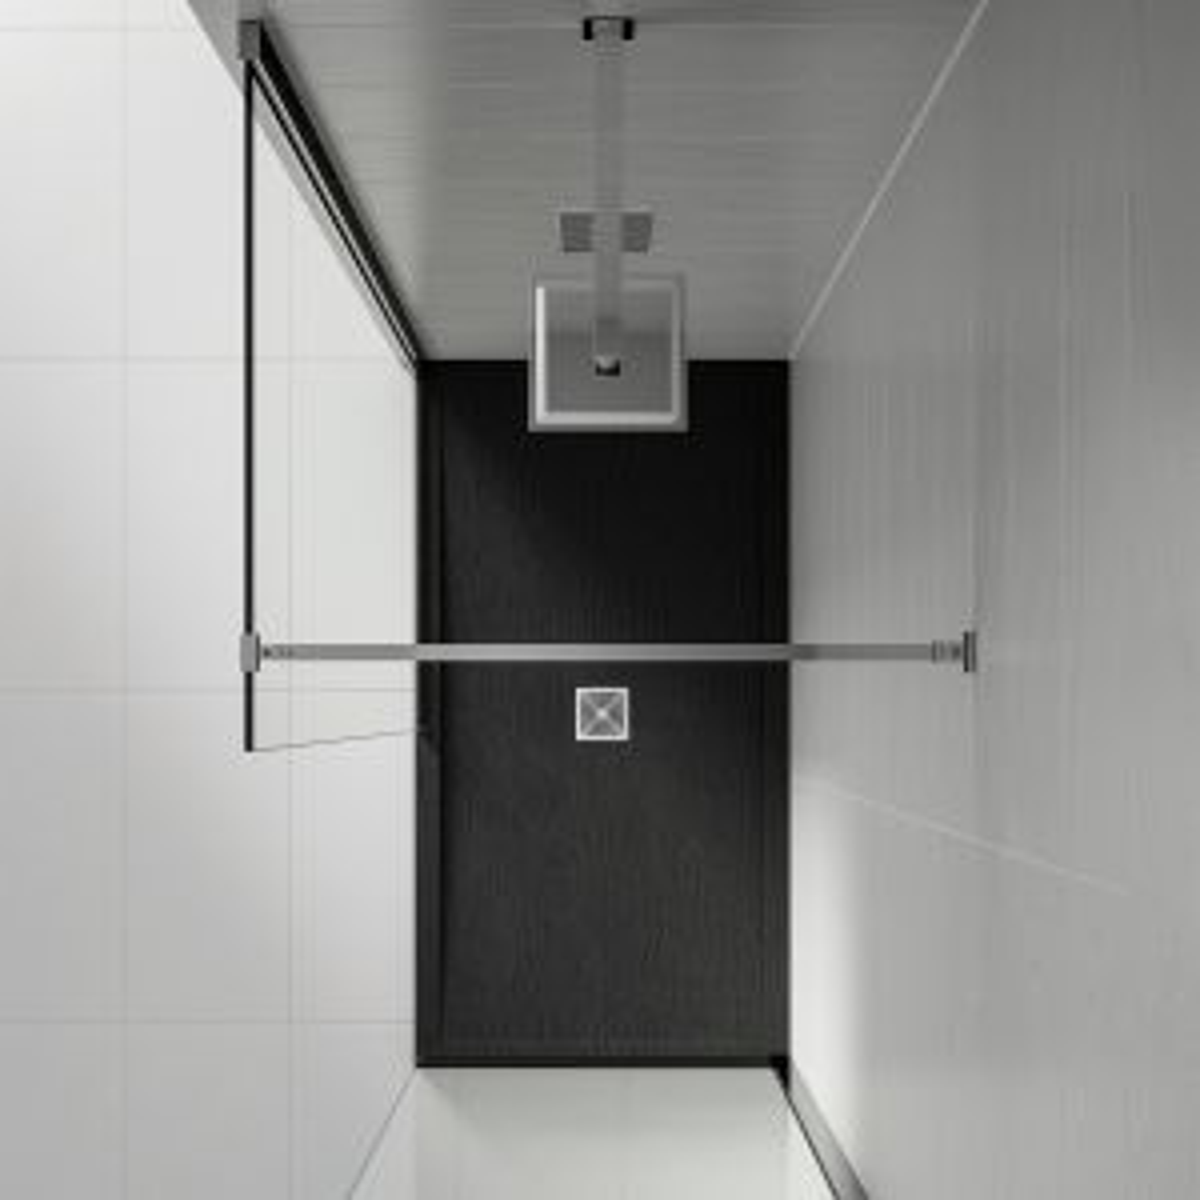 Aquadart Black Slate Shower Tray 1600 x 700 Overhead